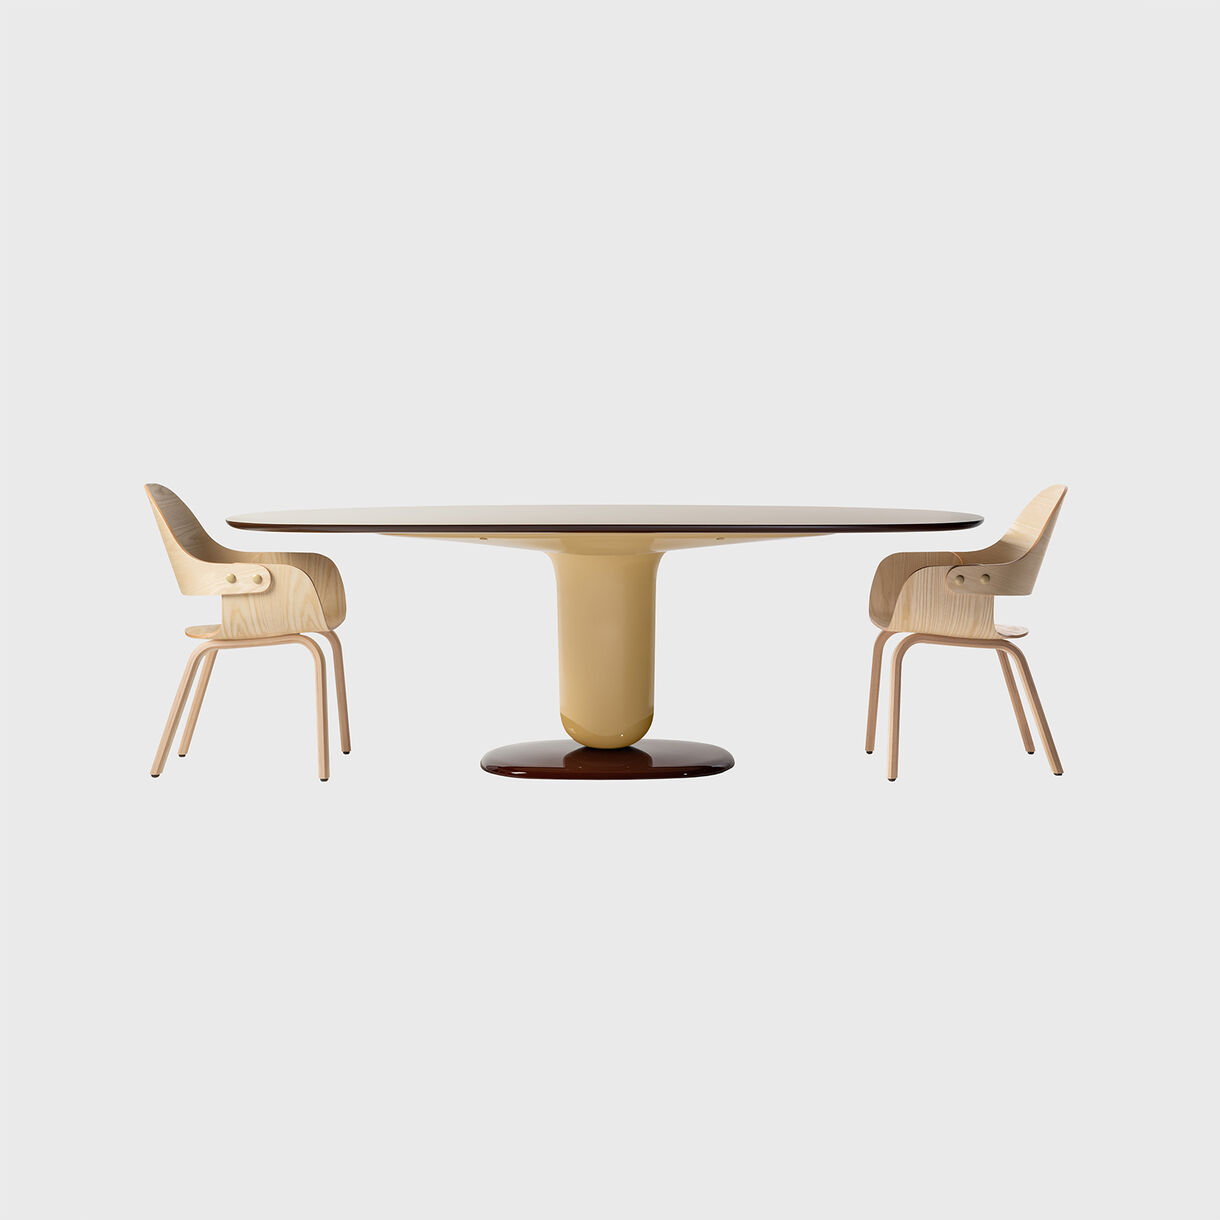 Explorer 5 Dining Table, Multicolour Beige